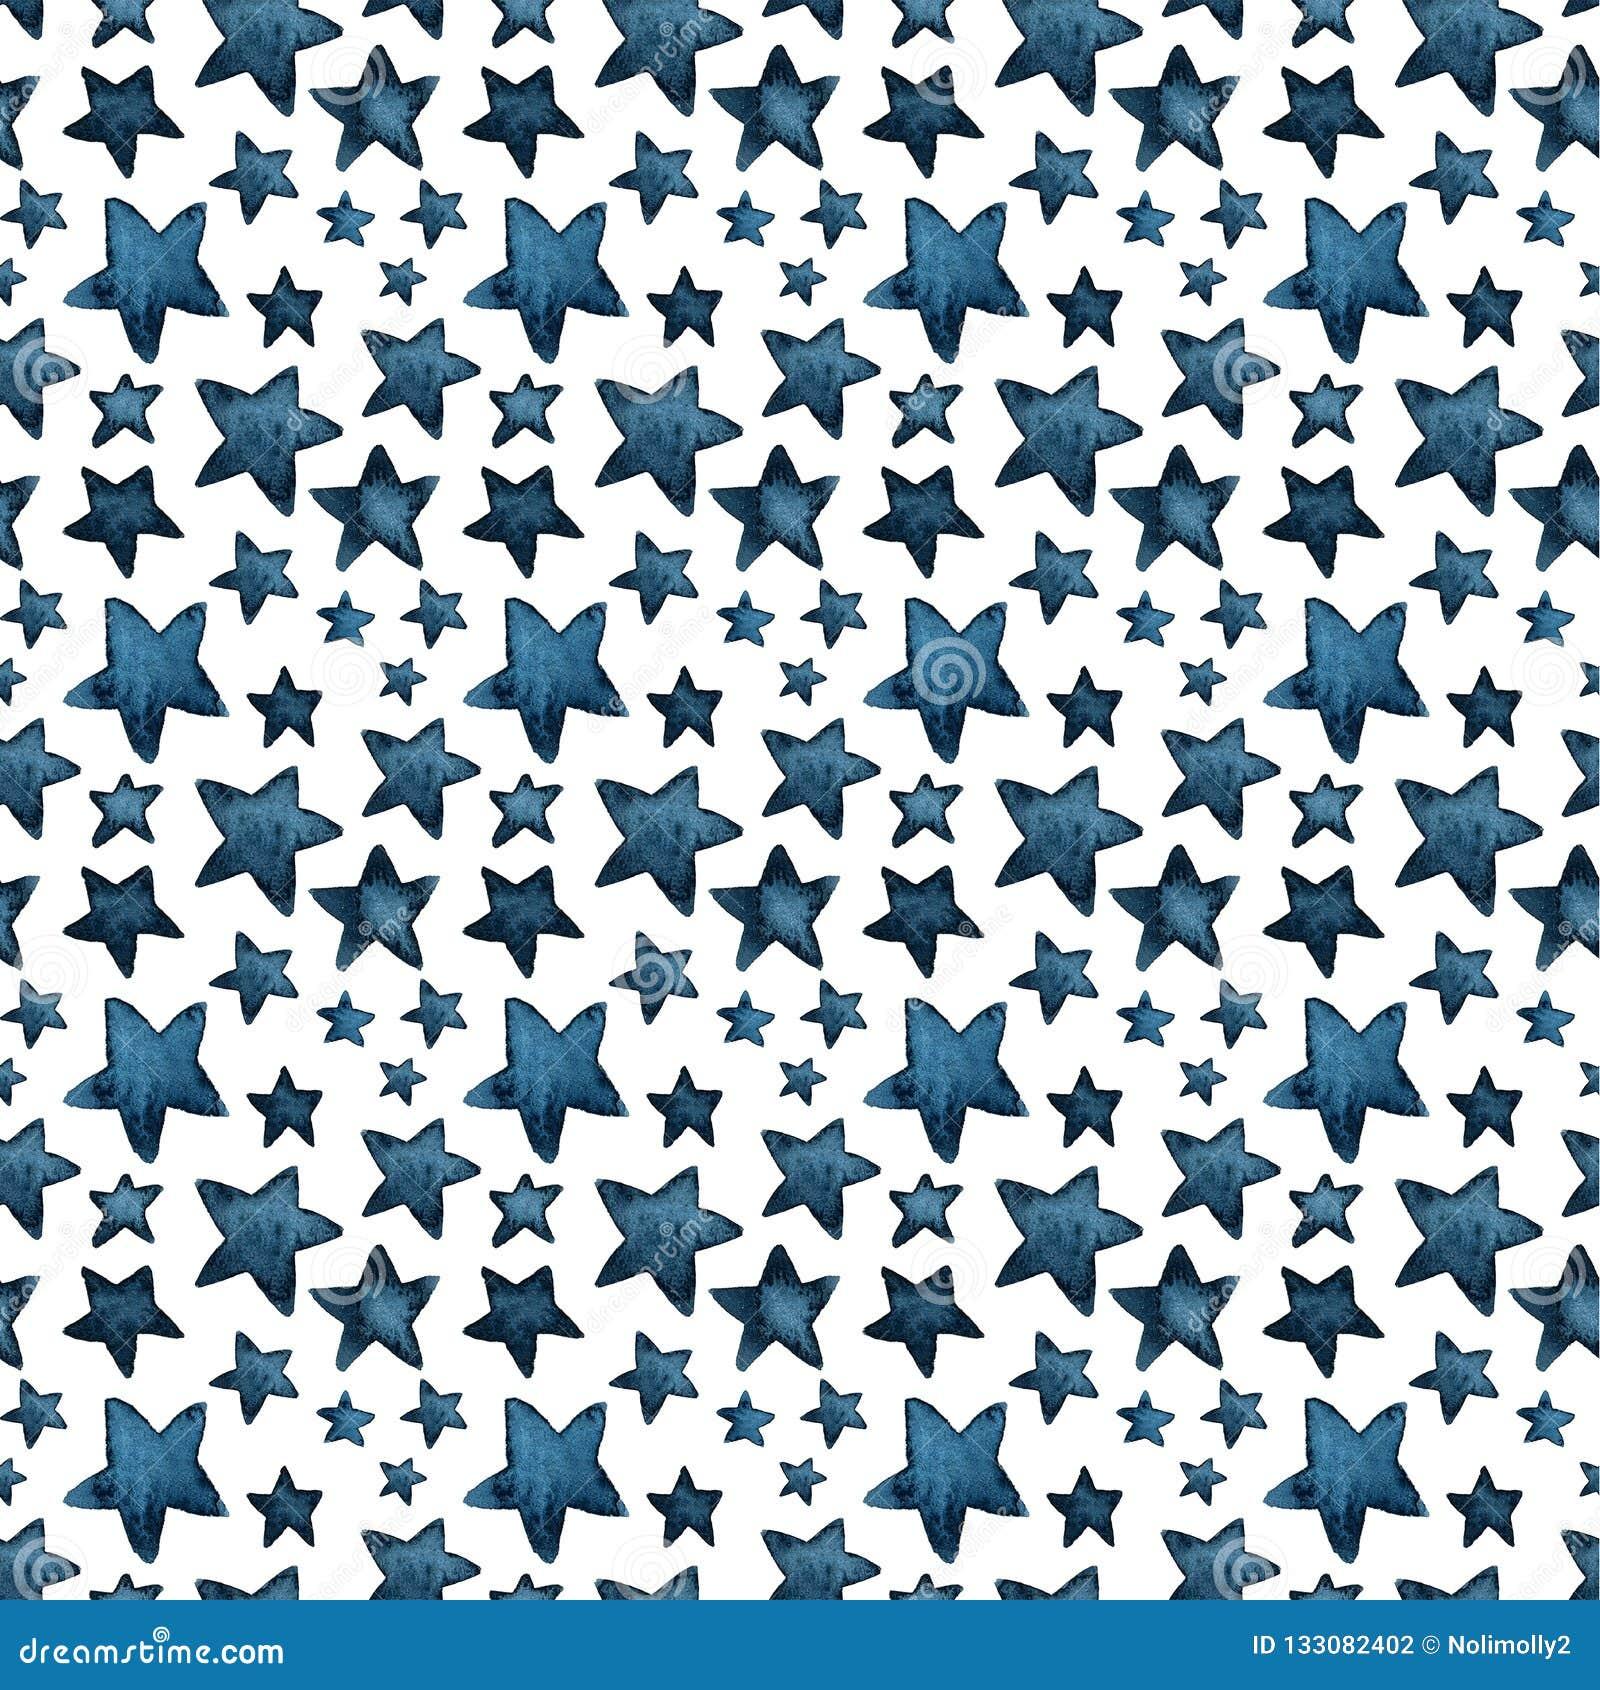 Cute big and small blue stars, salute of stars. pattern